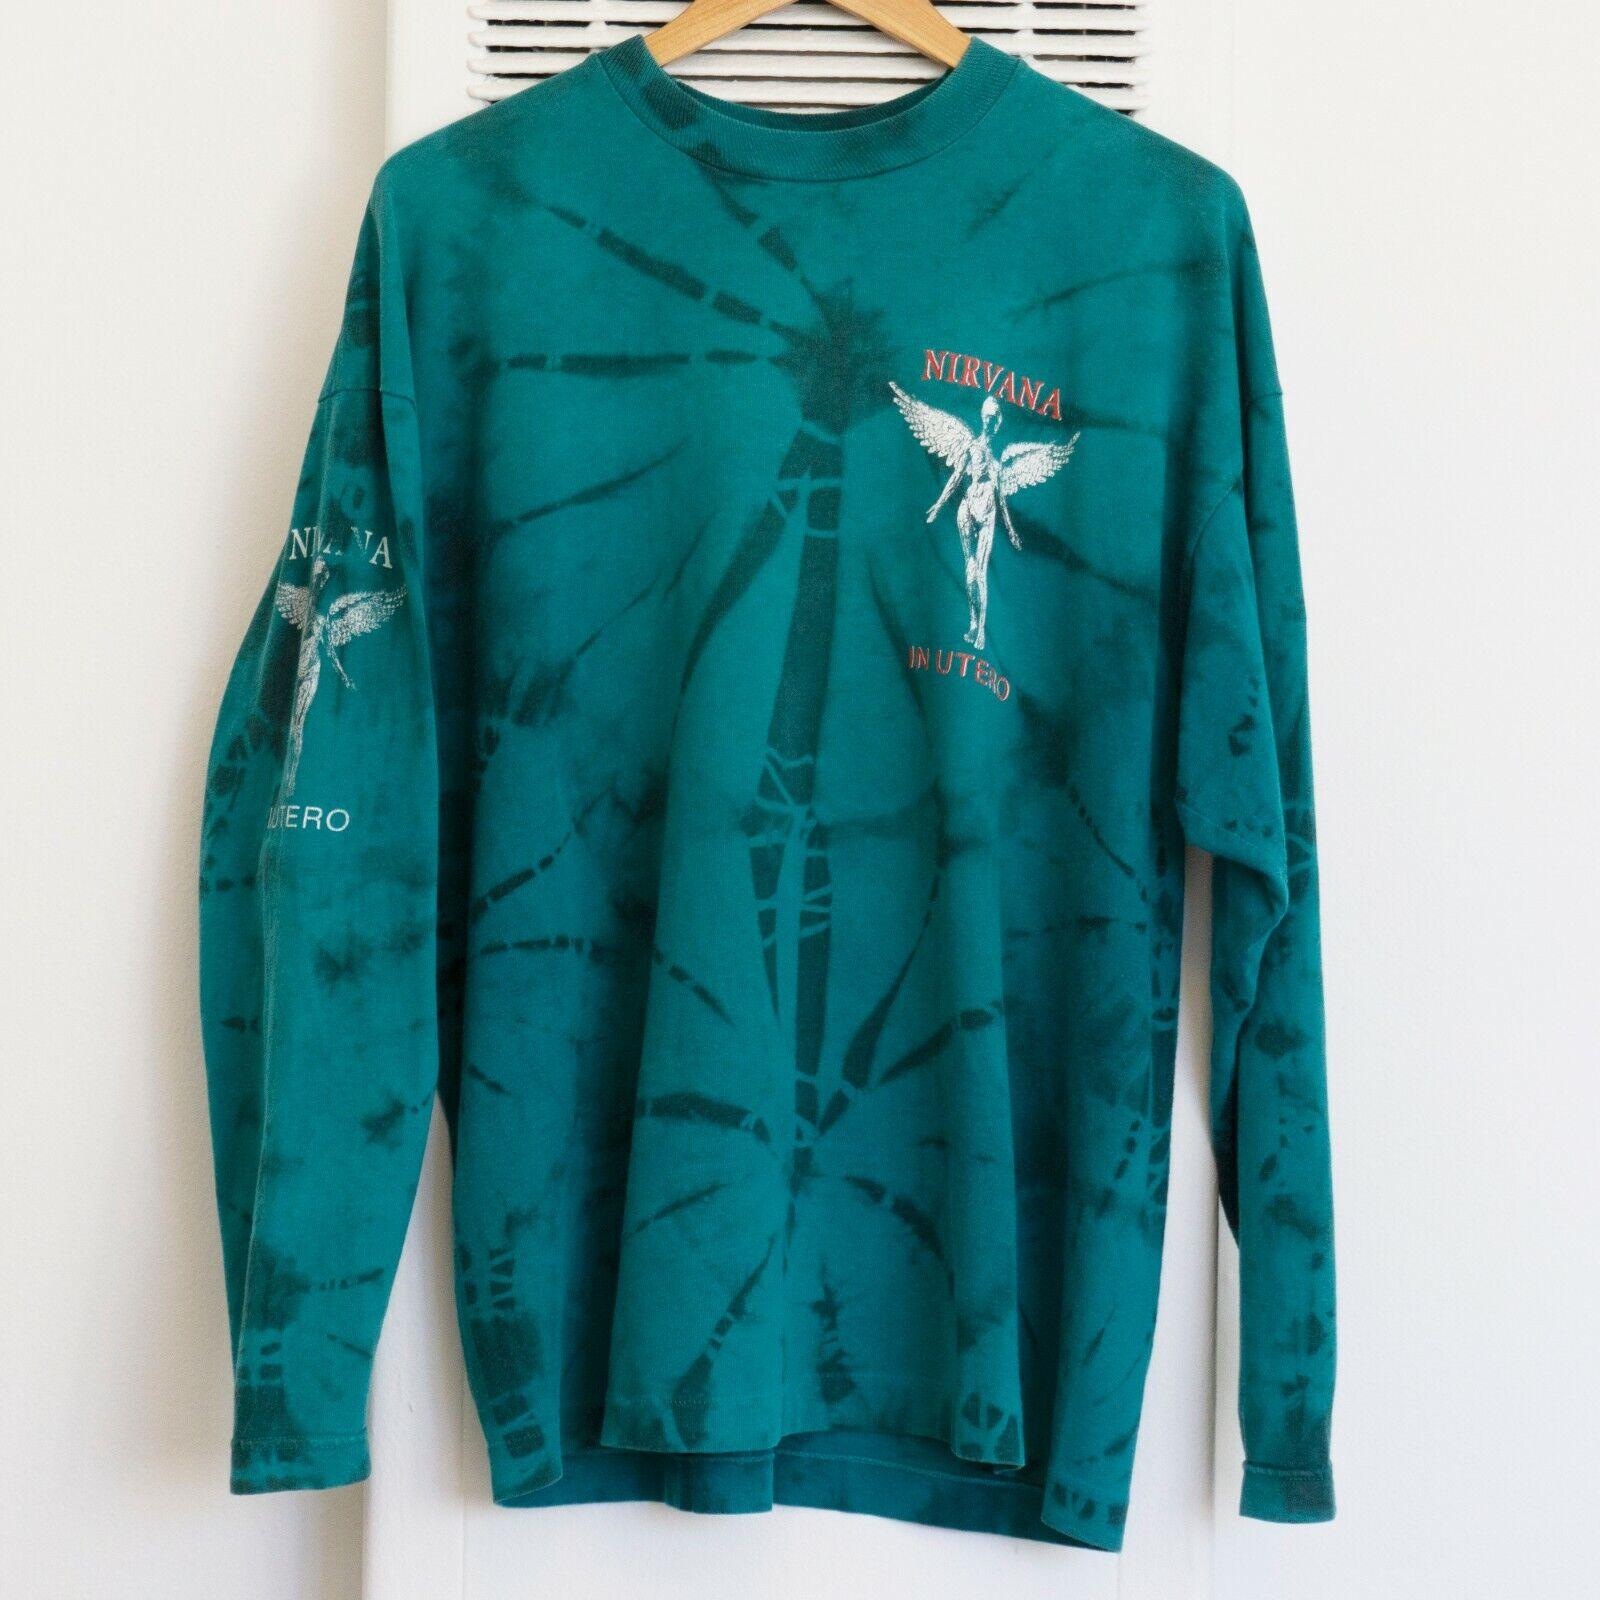 "Vintage 90s Nirvana ""In Utero"" Long Sleeve T-shirt Tie Dye Bjork Dinosaur Jr"